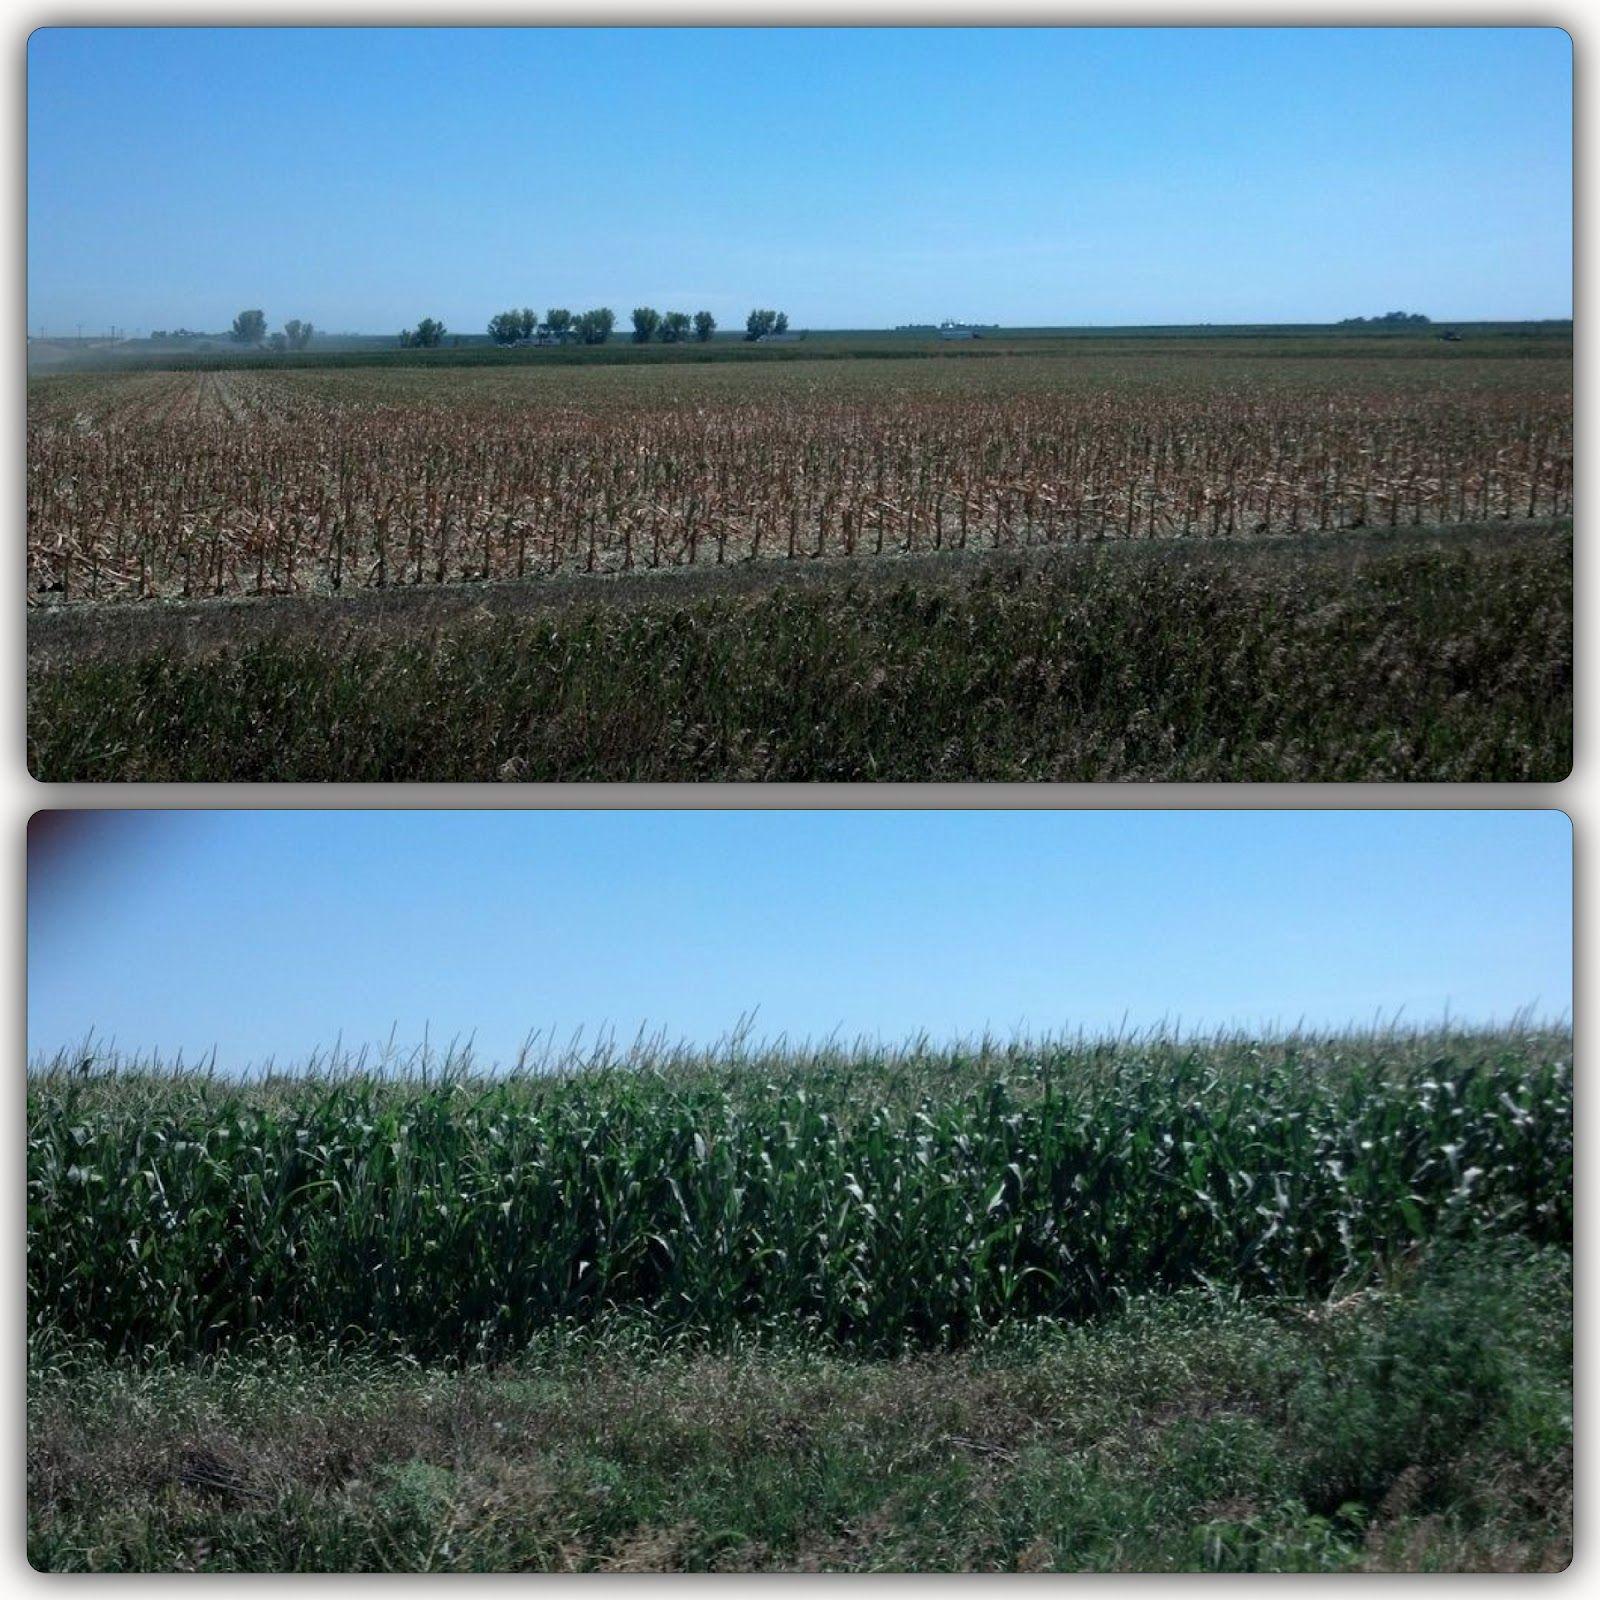 Robot Tractor Drought vs Irrigation in Nebraska